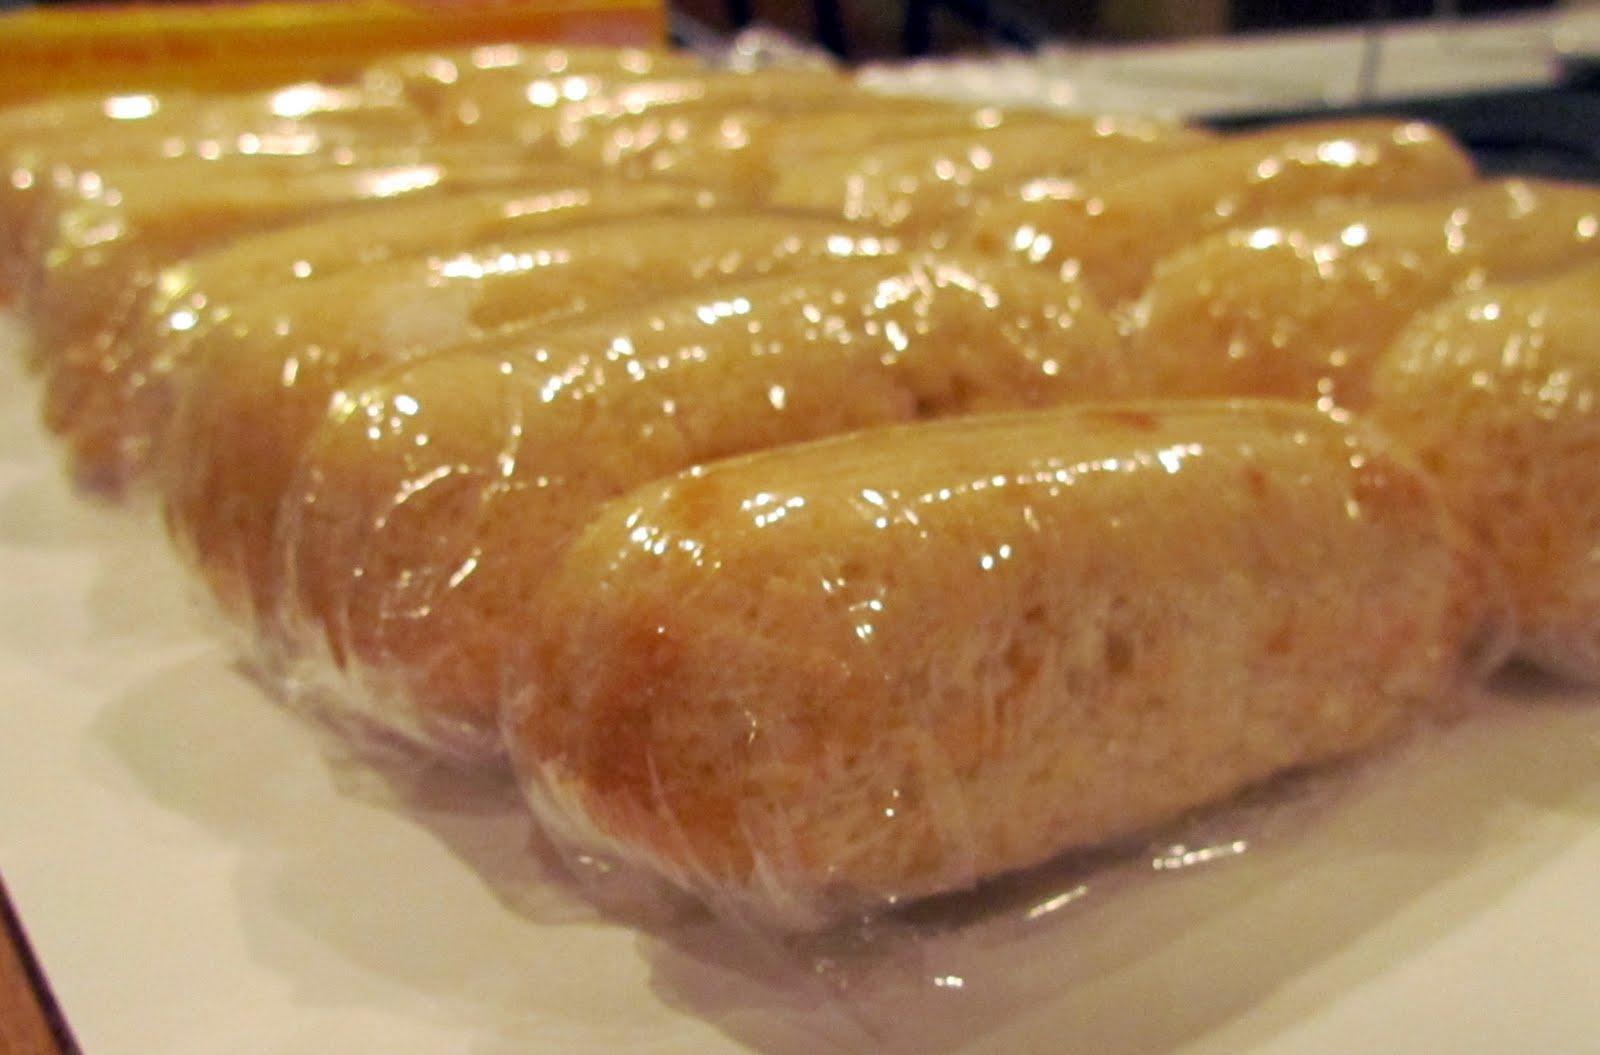 Cinnamon and Cynicism: Homemade Twinkies!